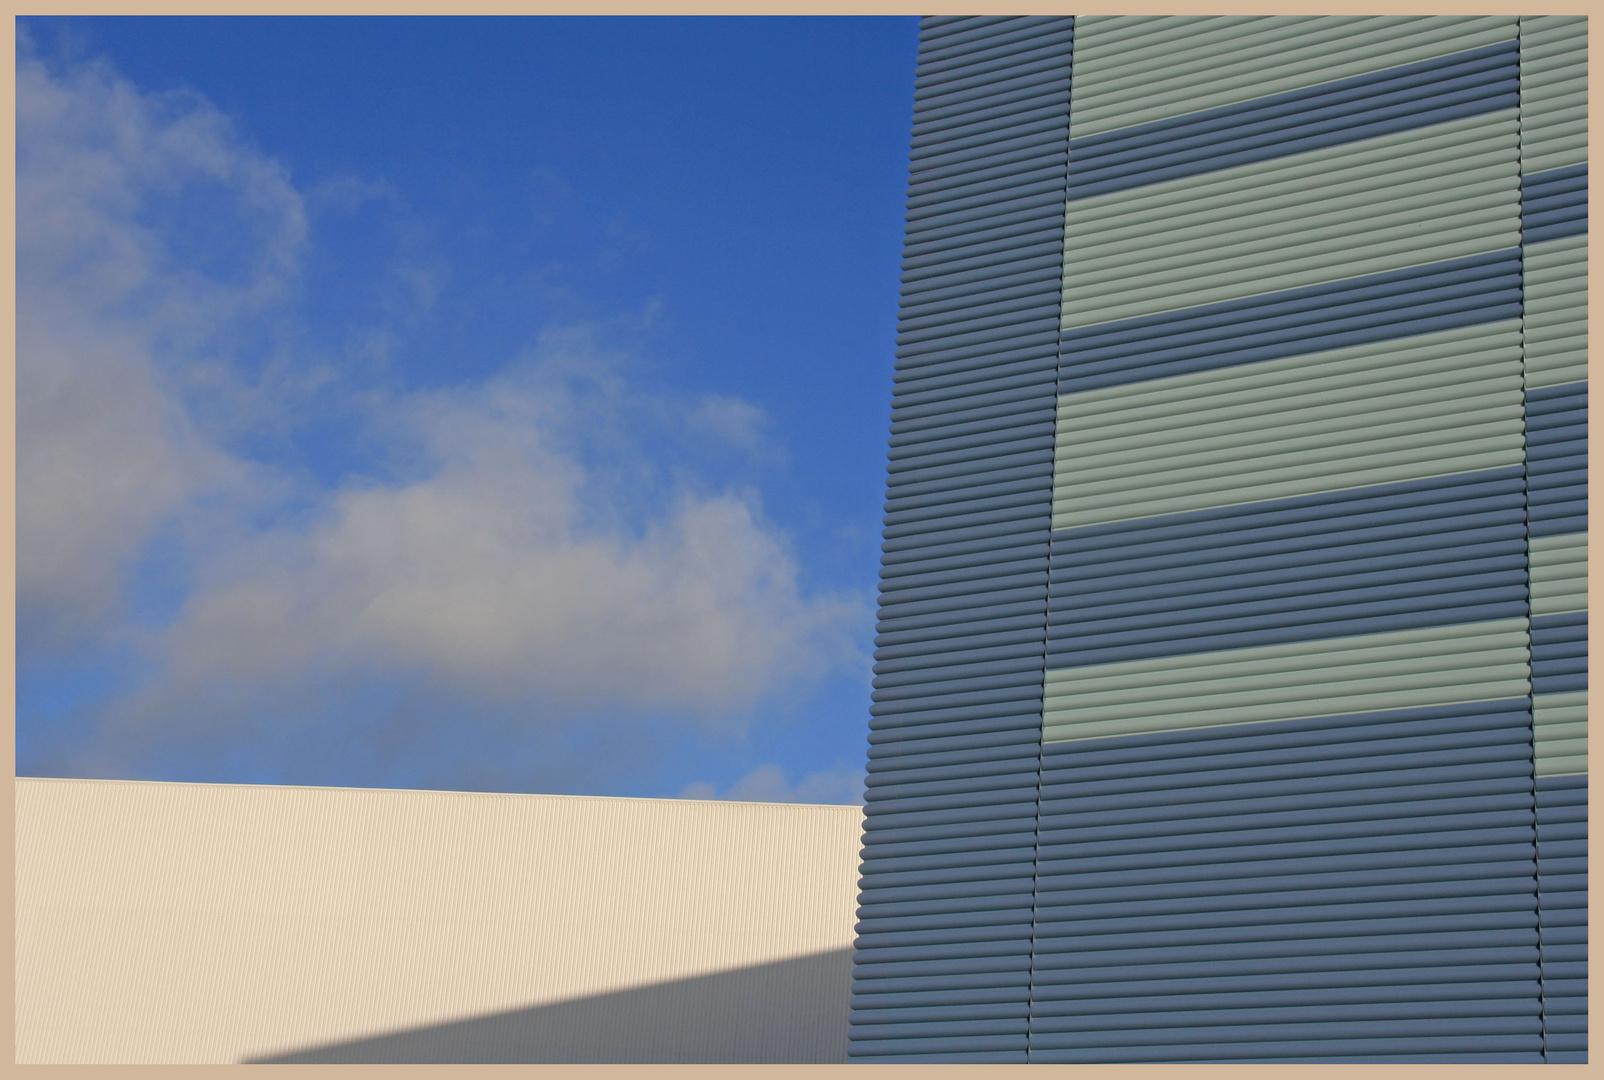 NAREC Building Blyth 6